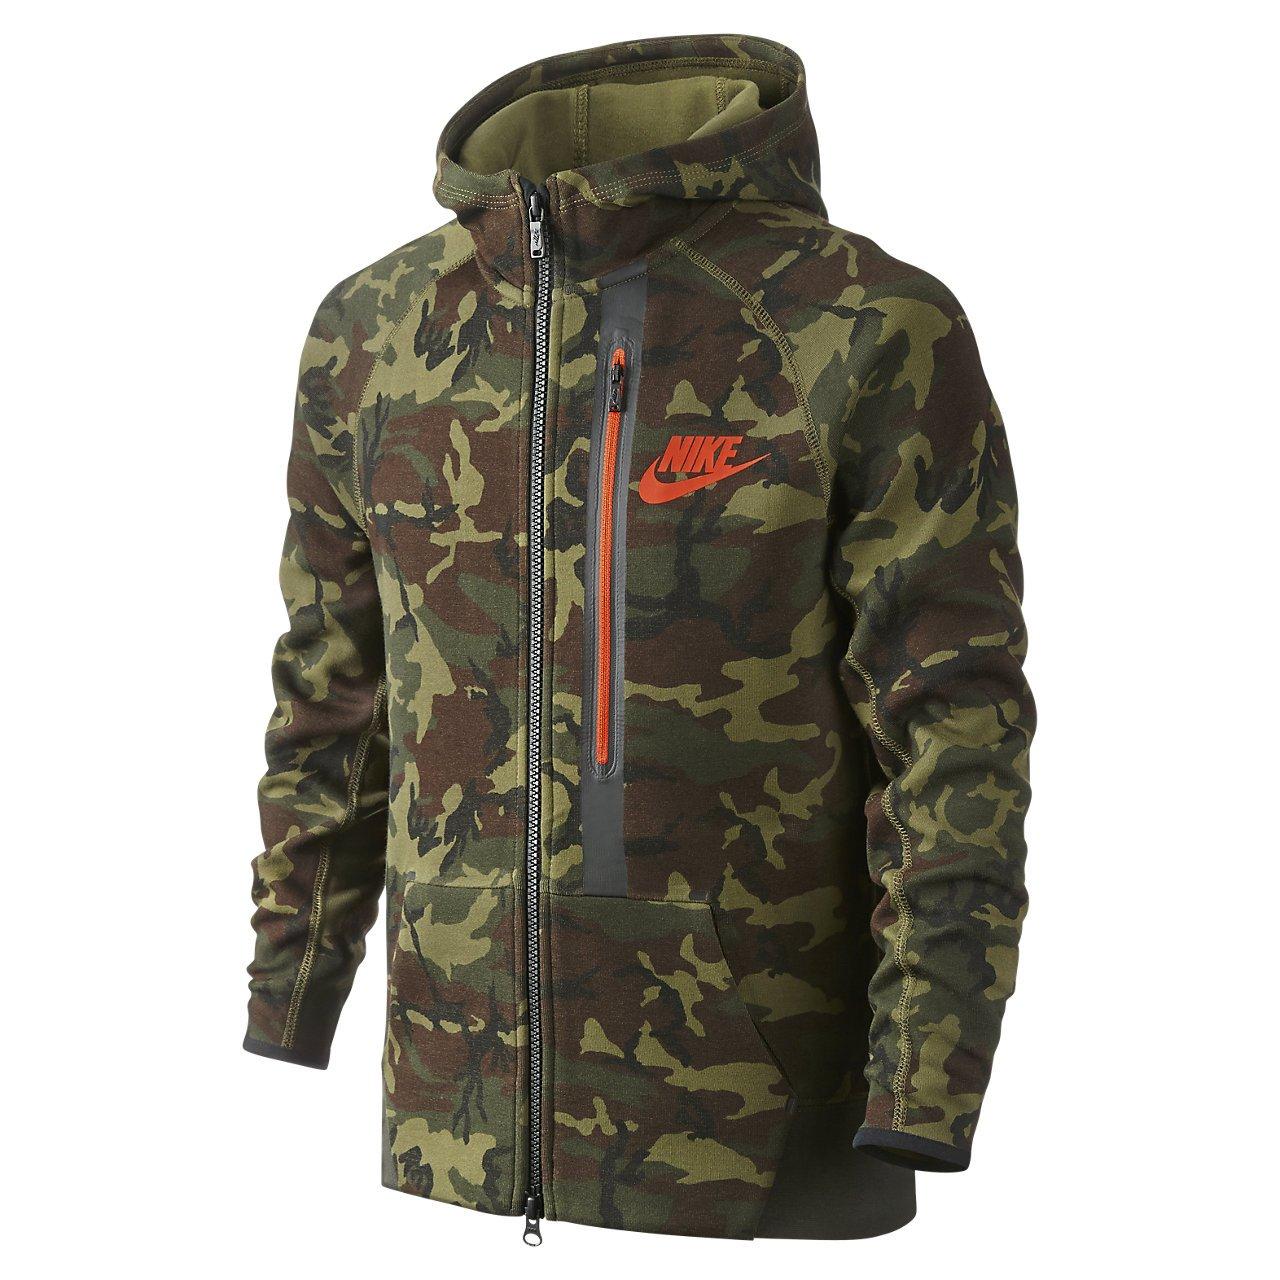 Nike Youth Boys Tech Fleece Allover Print Full-Zip Hoodie 716805-355 (Large) Camo Green by NIKE